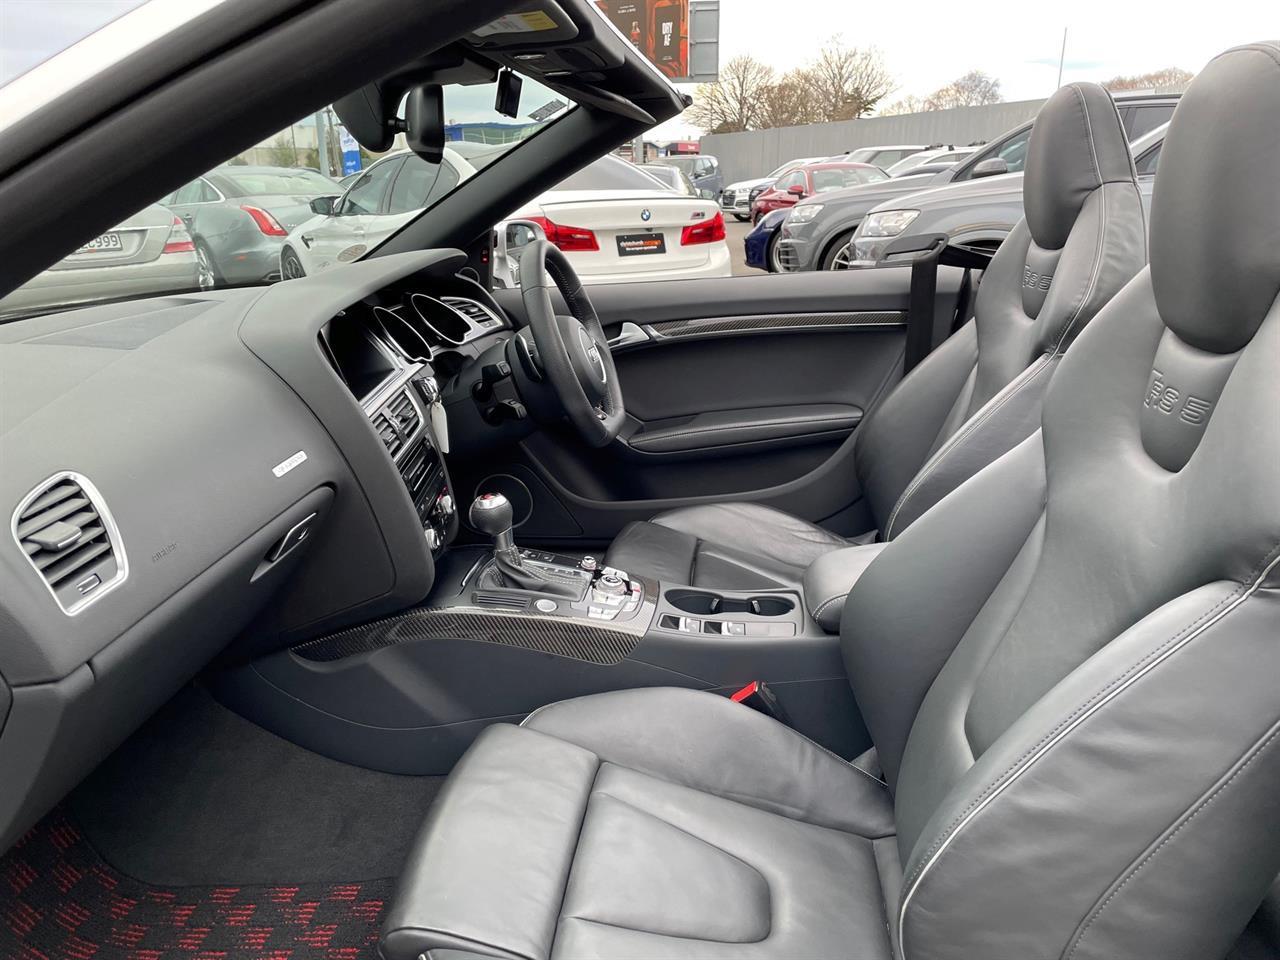 image-5, 2013 Audi RS5 4.2 V8 FSI Facelift Convertible at Christchurch